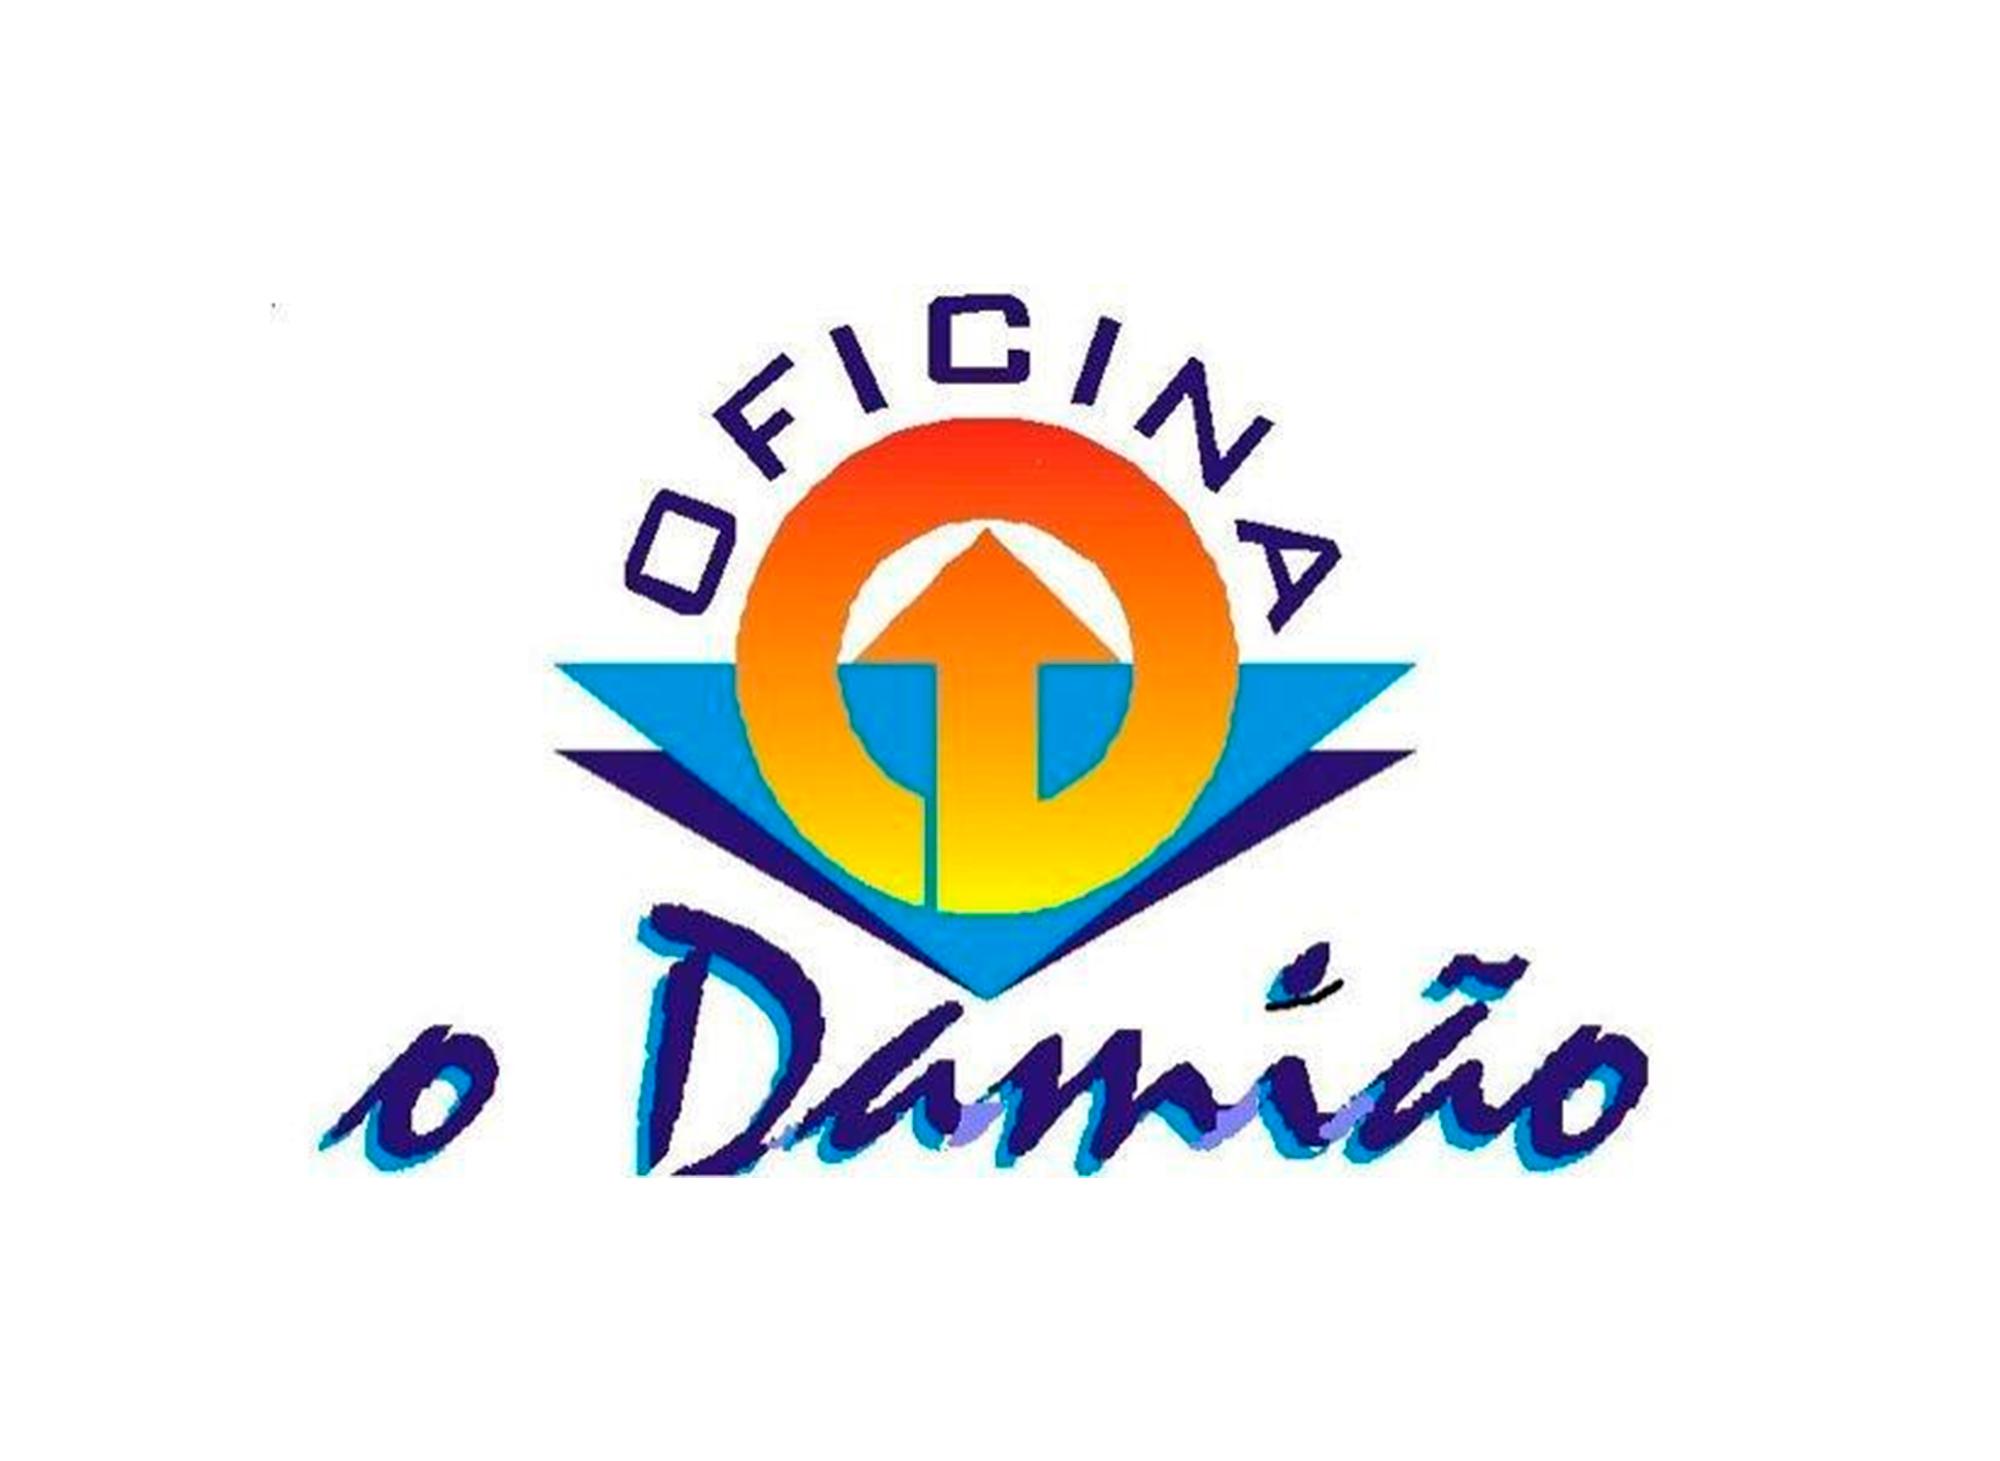 oficina-o-damiao-clientes-atendidos-agencia-diretriz-digital-marketing-fortaleza